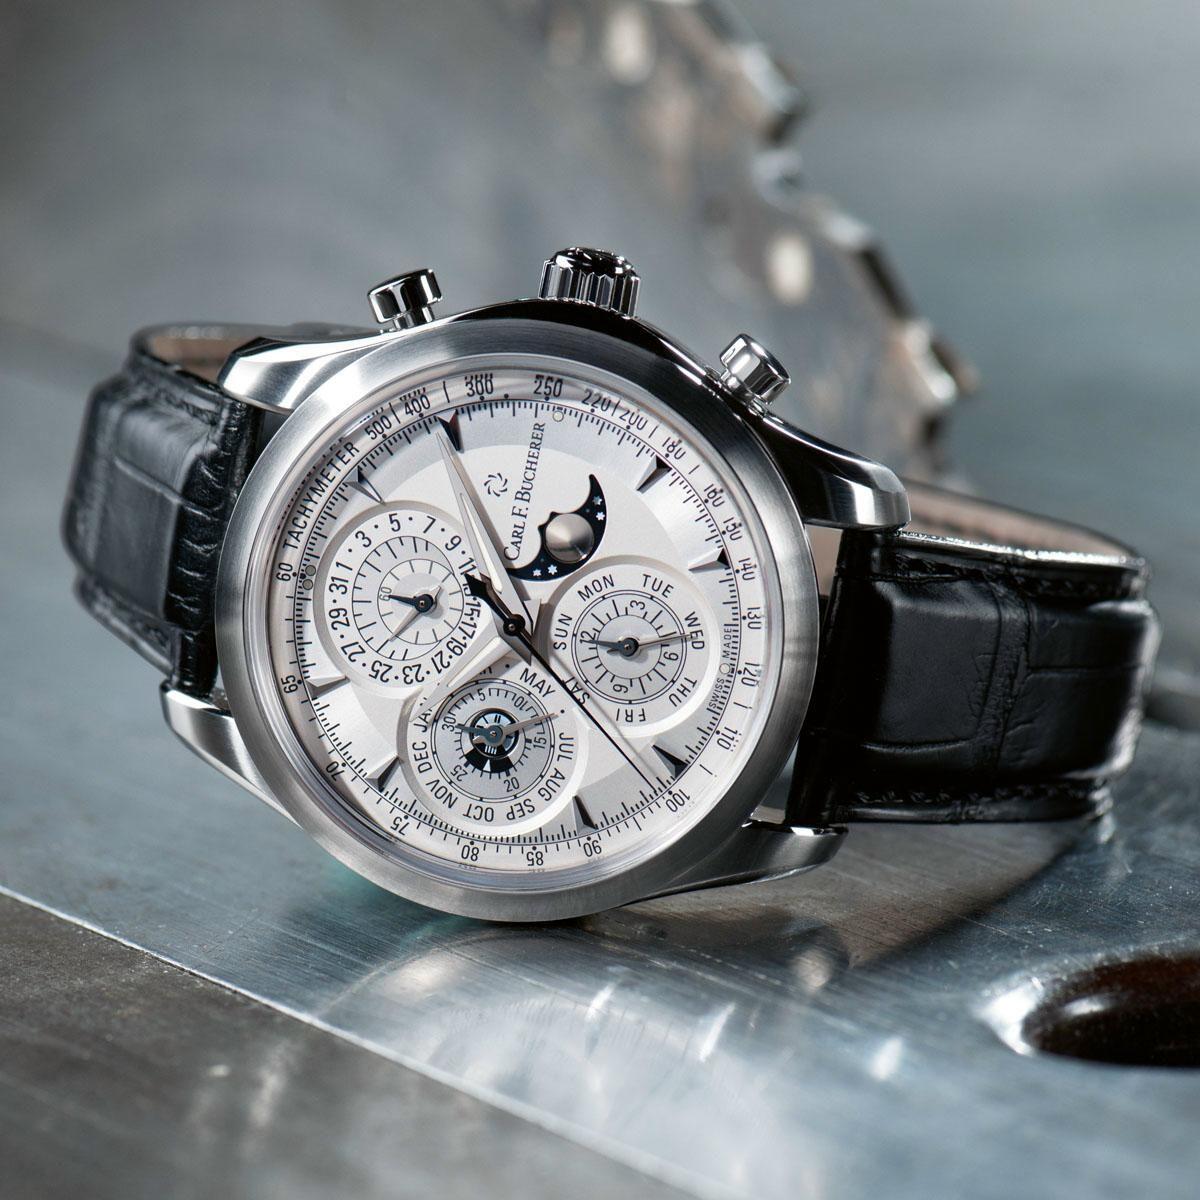 Carl F Bucherer Manero Chronoperpetual Watches For Men Vintage Watches Fine Watches